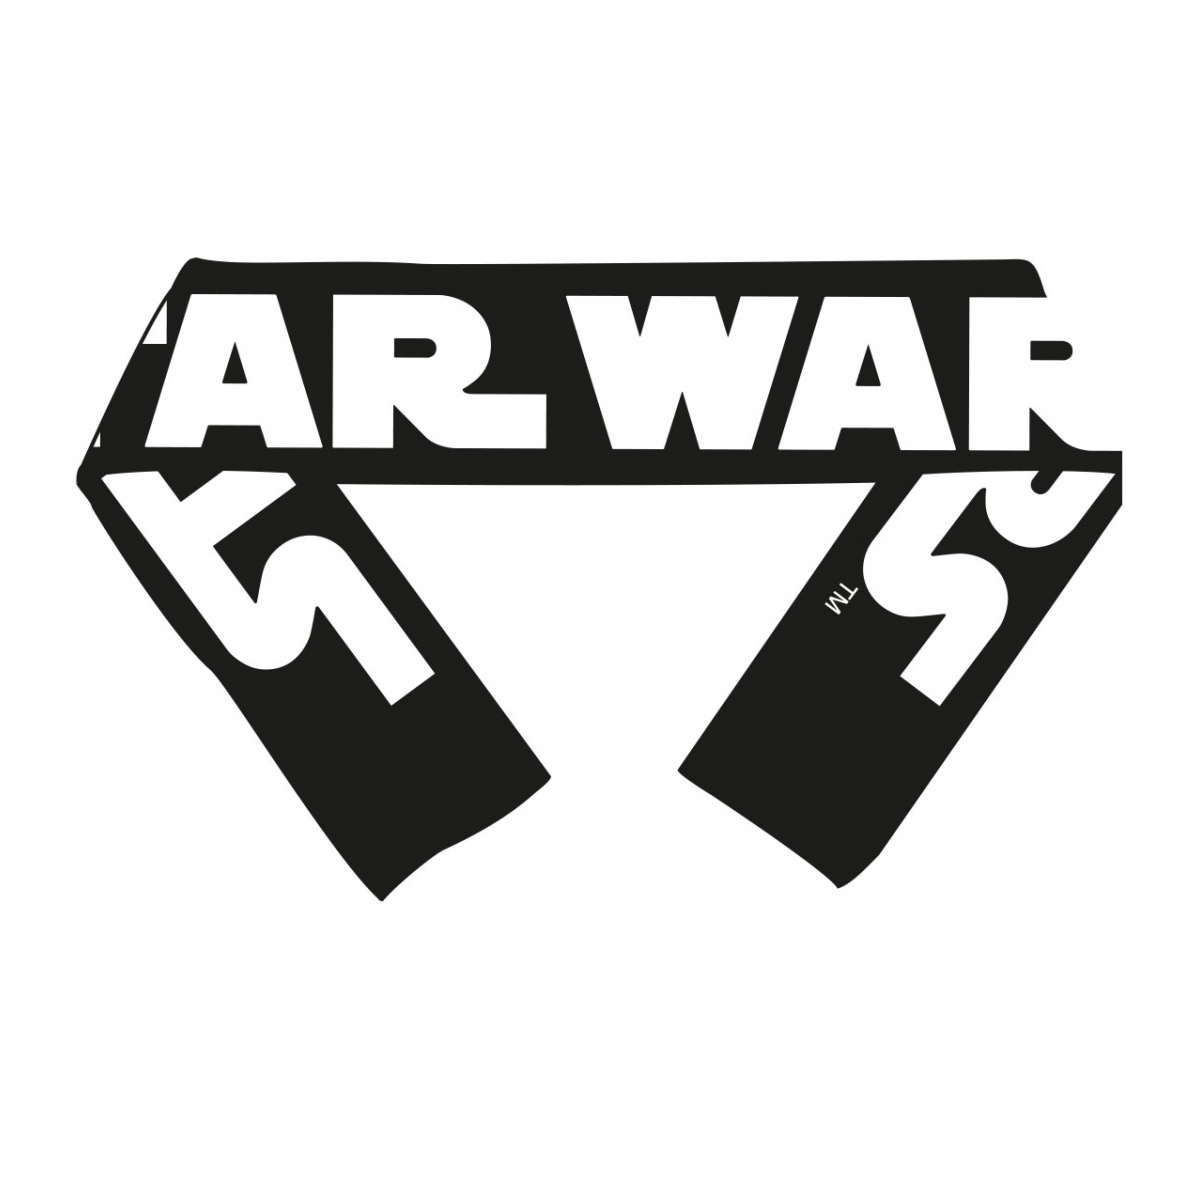 star wars episode viii echarpe classic logo figurine